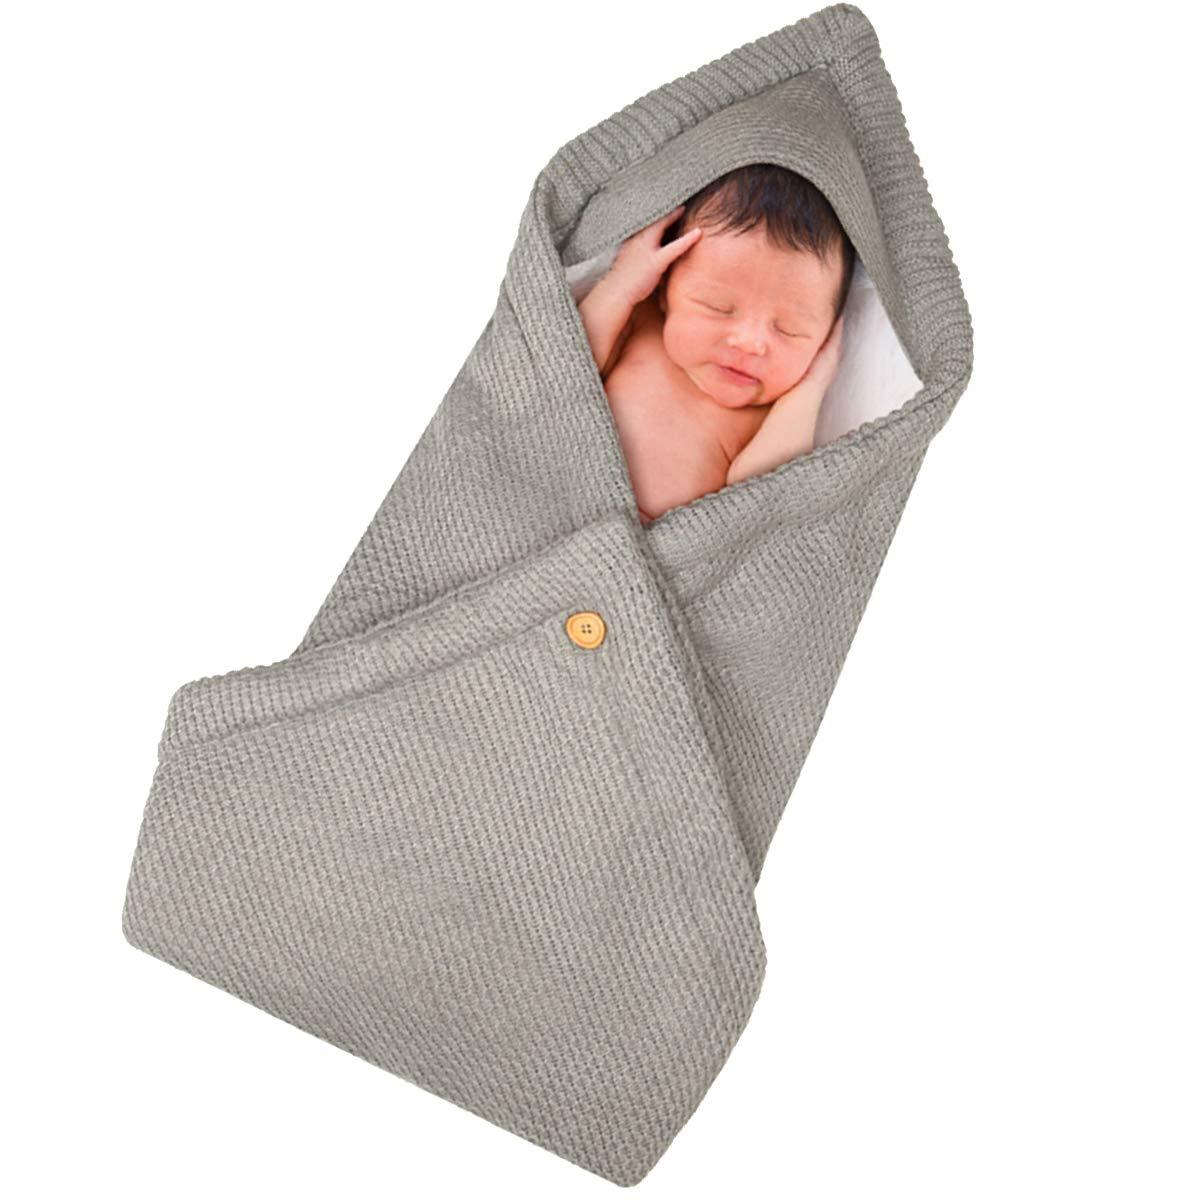 Newborn Baby Swaddle Blanket, Soft Thick Baby Kids Toddler Knit Warm Fleece Blanket Swaddle Sleeping Wrap Bag Sack Stroller Unisex Baby Sleep Bag for 0-12 Month Baby Boys Girls (004 Light Grey)